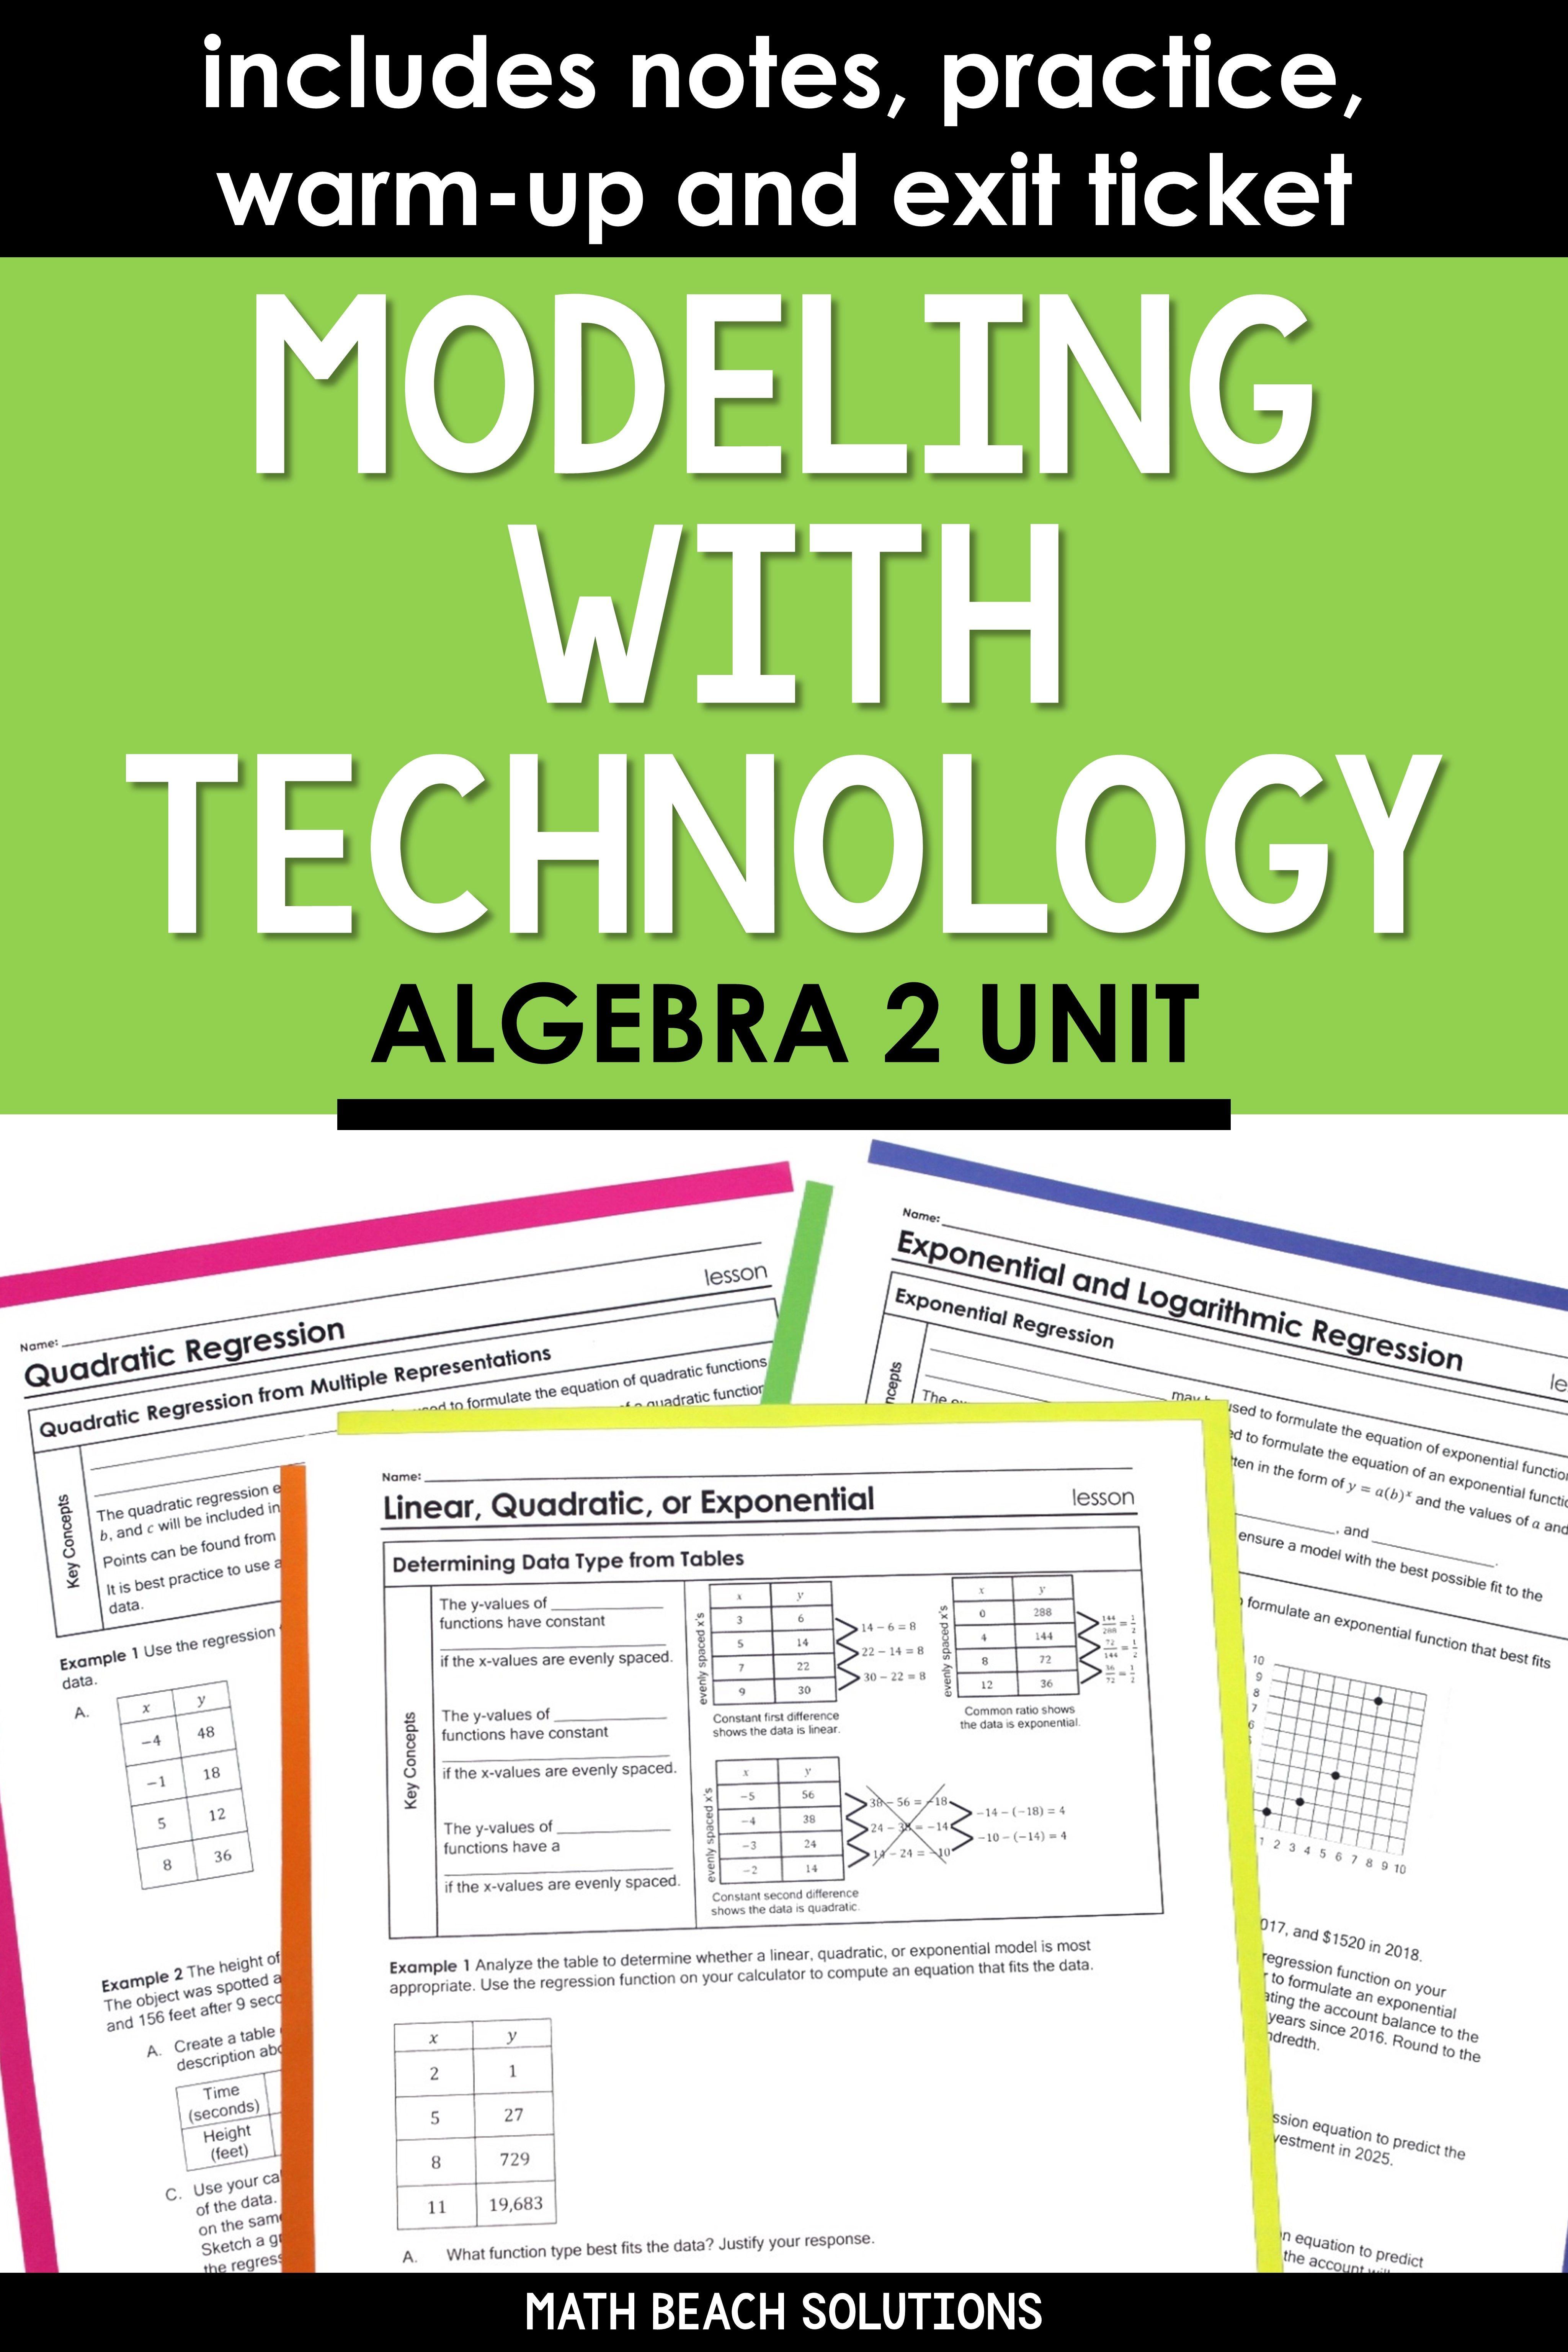 Modeling With Technology Algebra 2 Unit